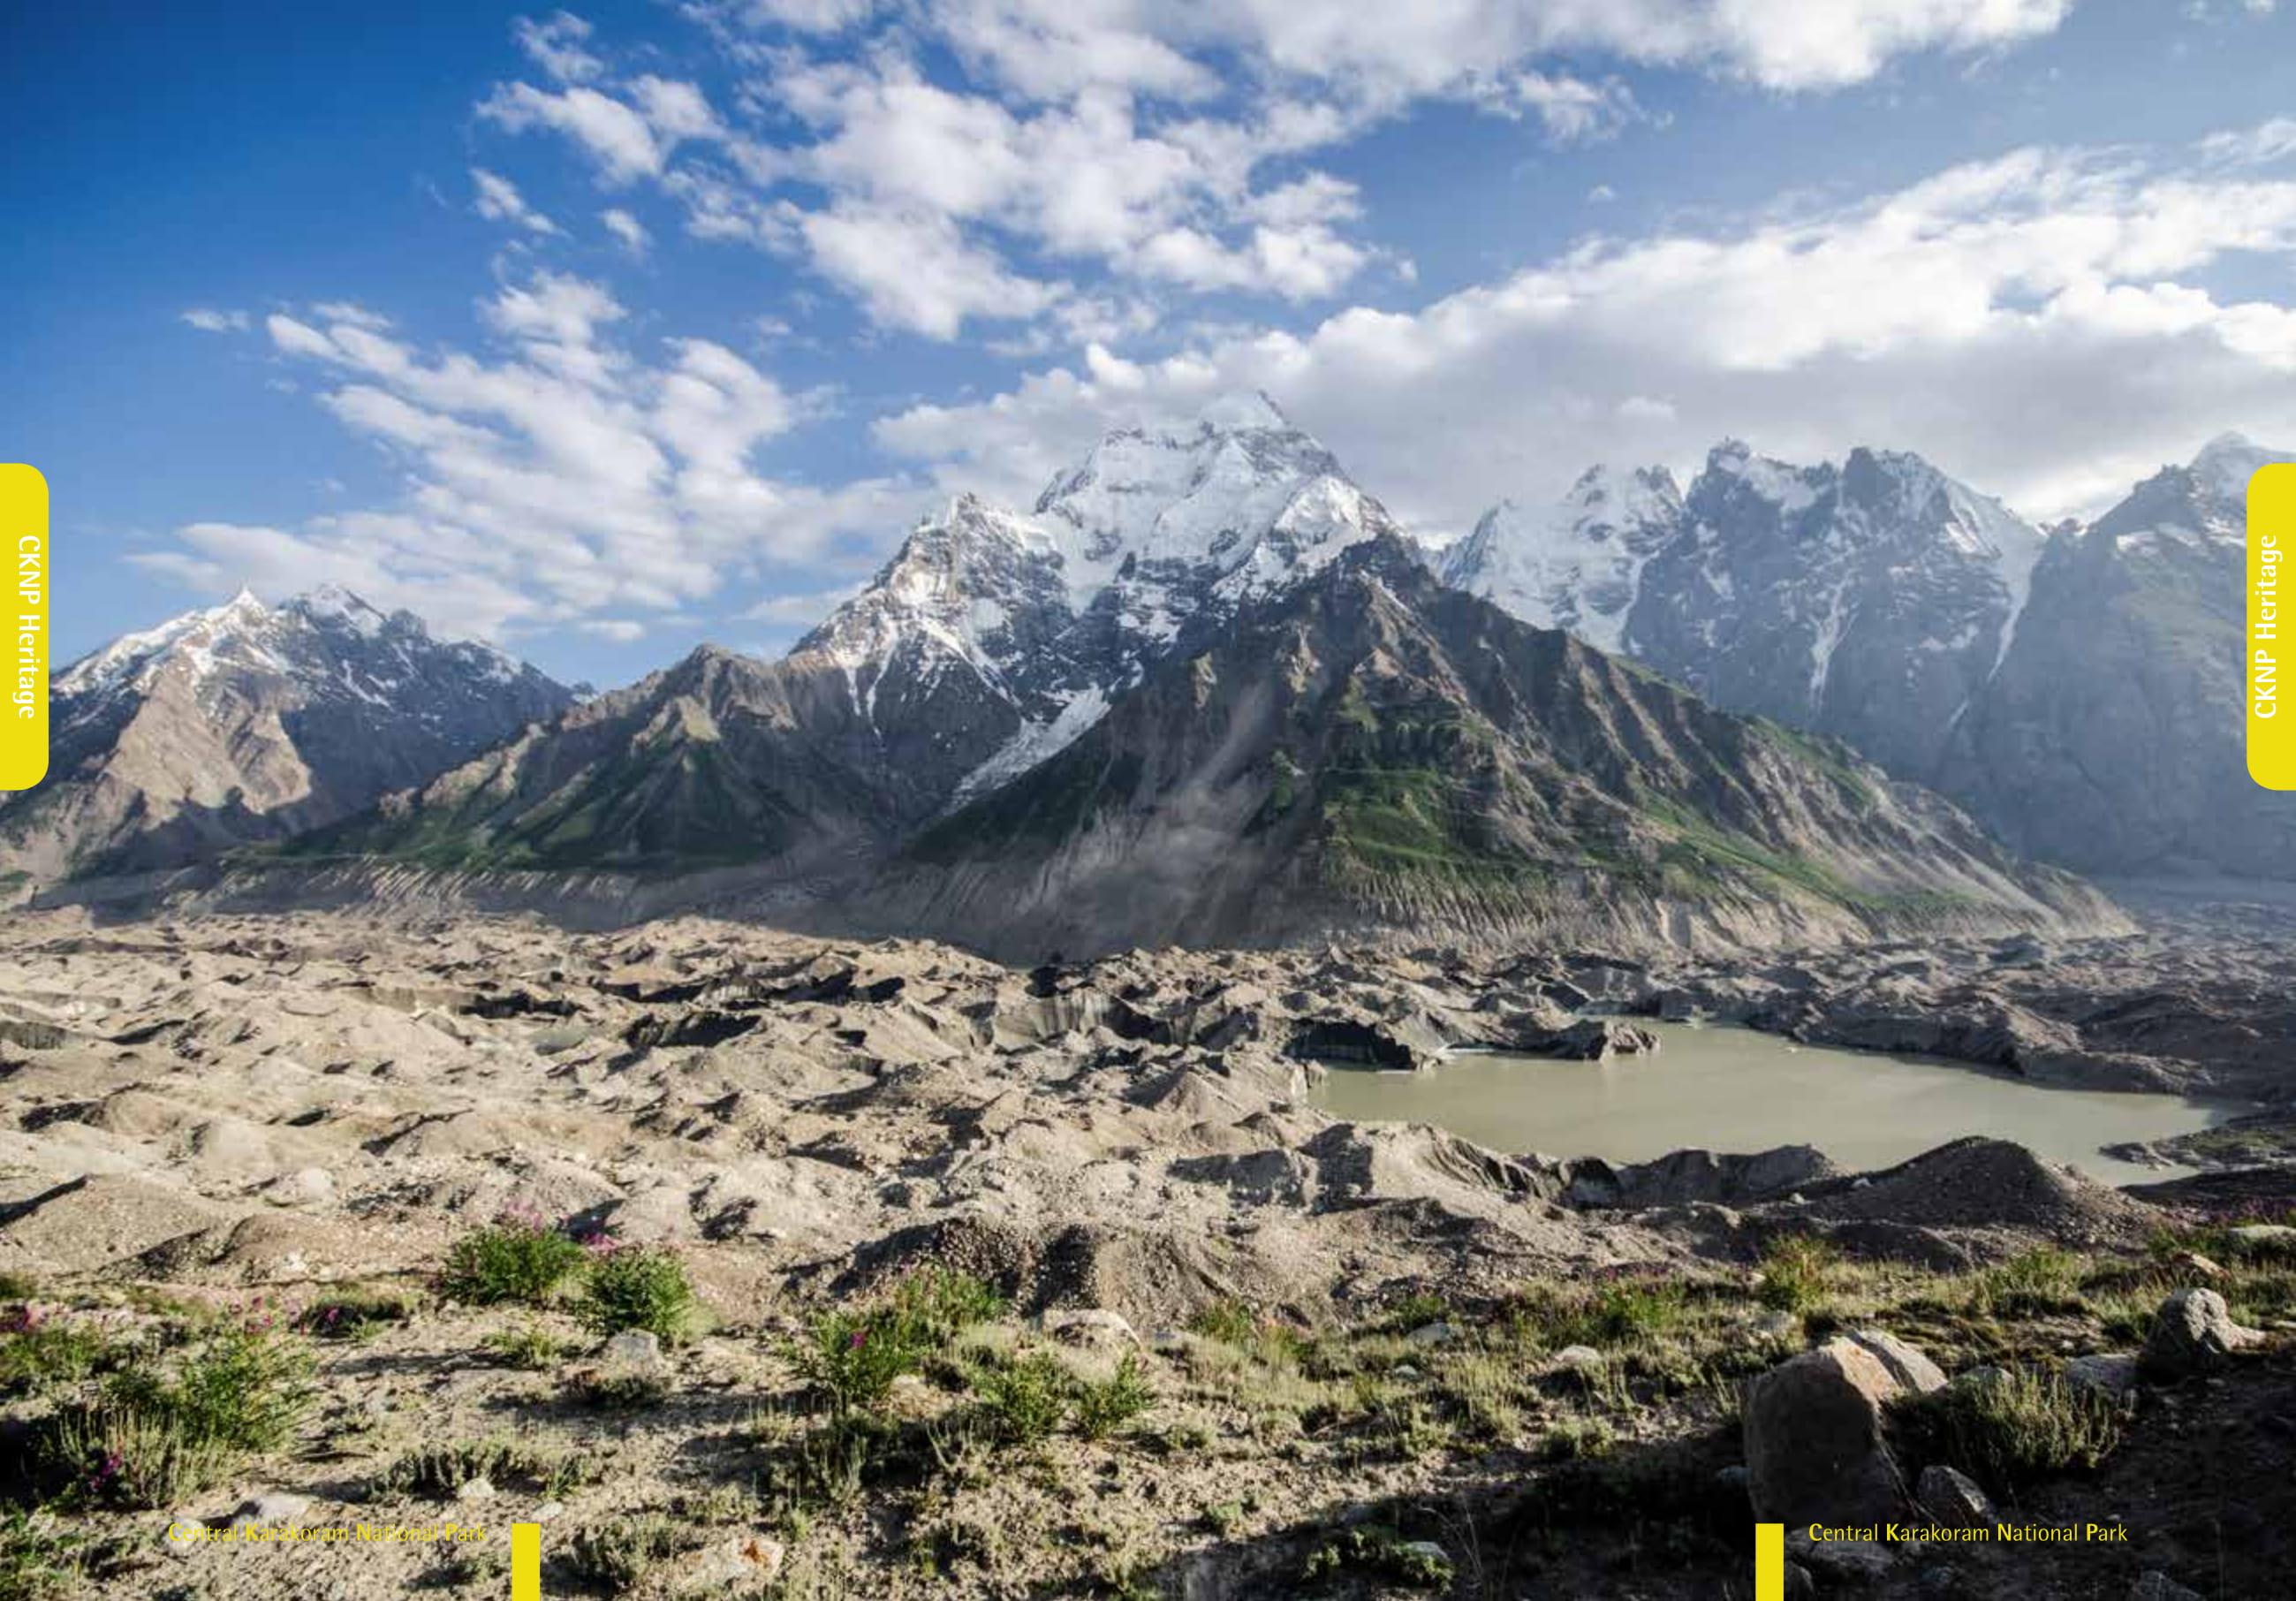 CKNP, Central Karakorum National Park, Pakistan, Parco Nazionale, Guida